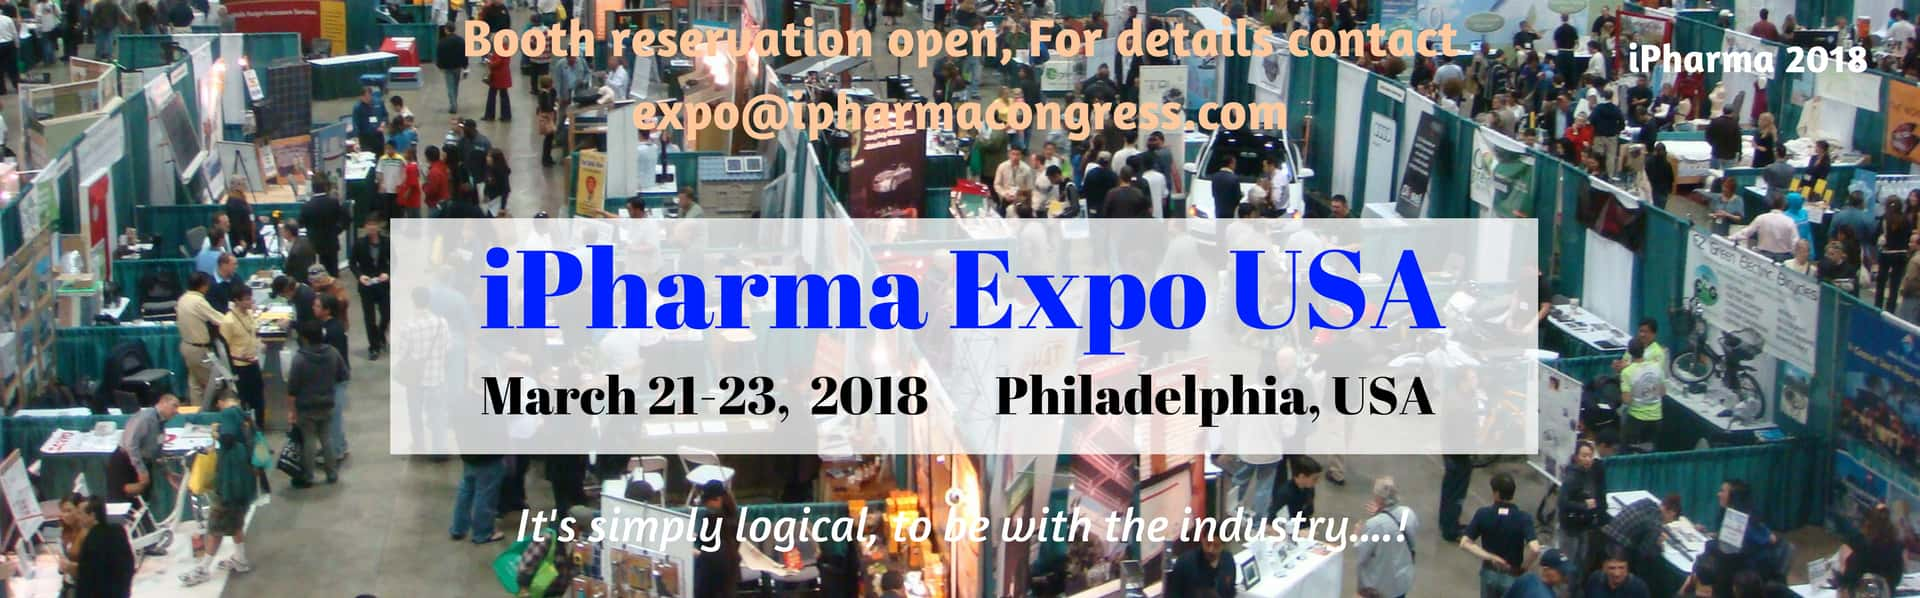 Expo Banner- iPharma 2018